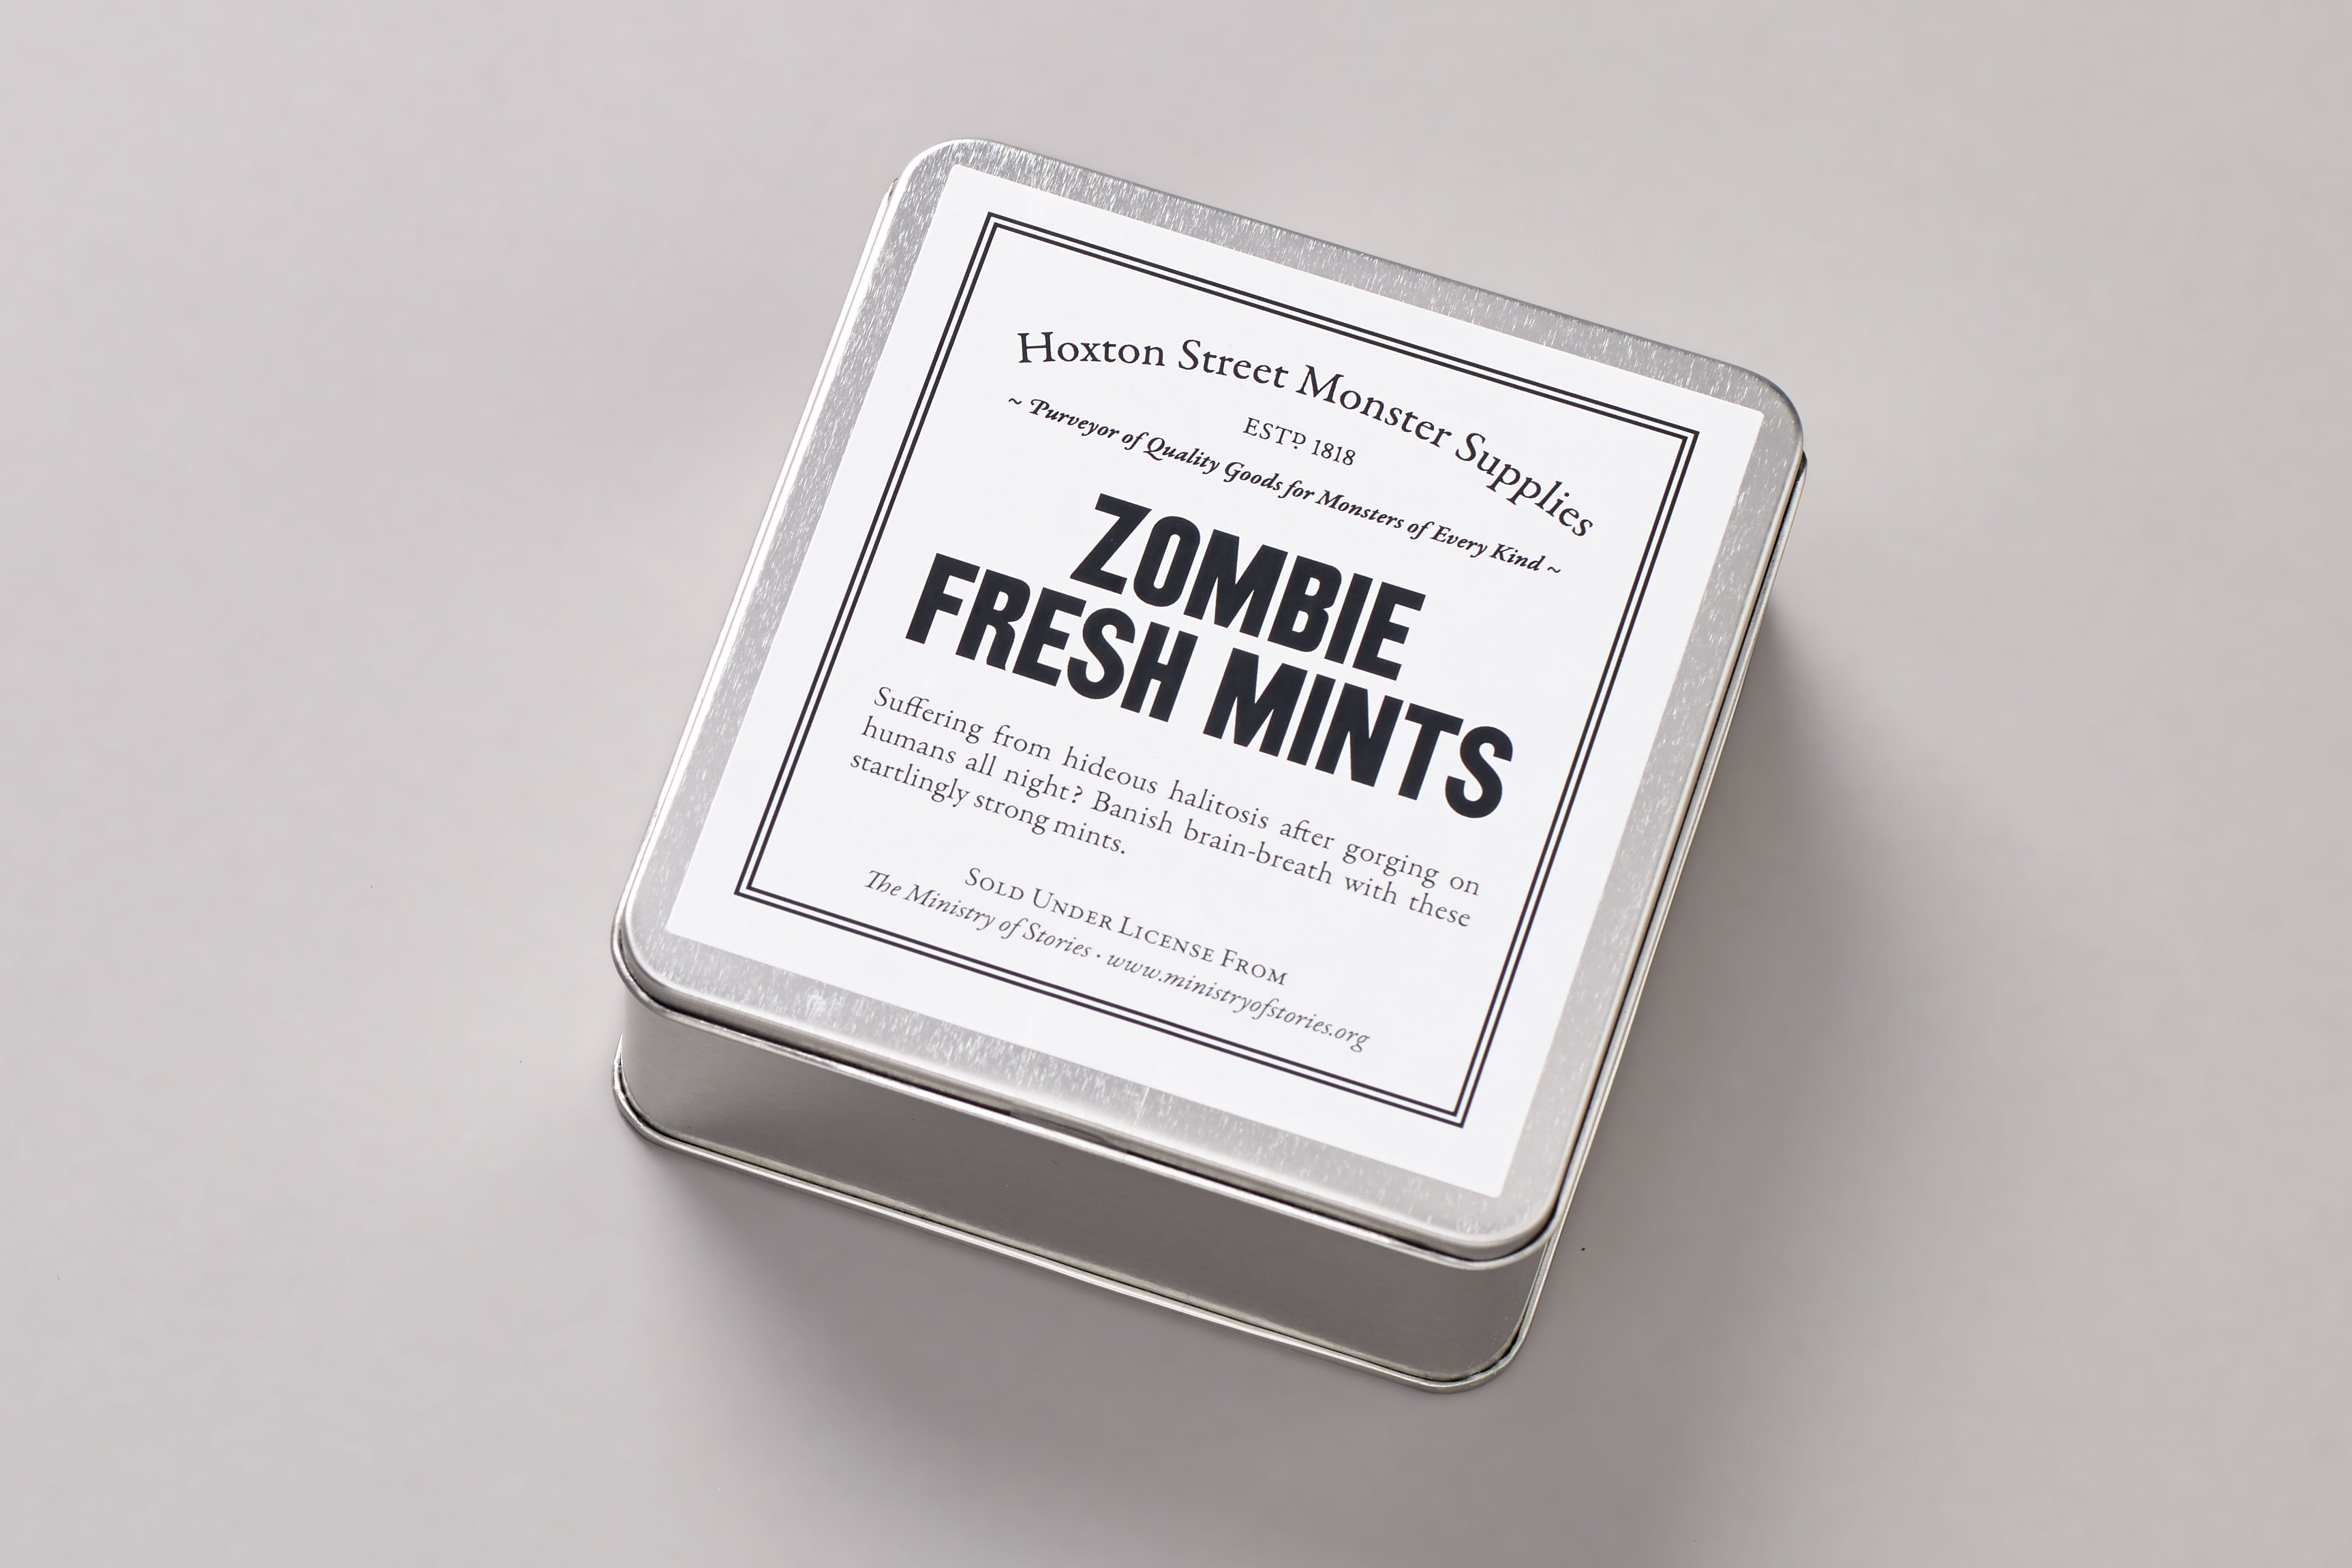 Zombie-Freshmints